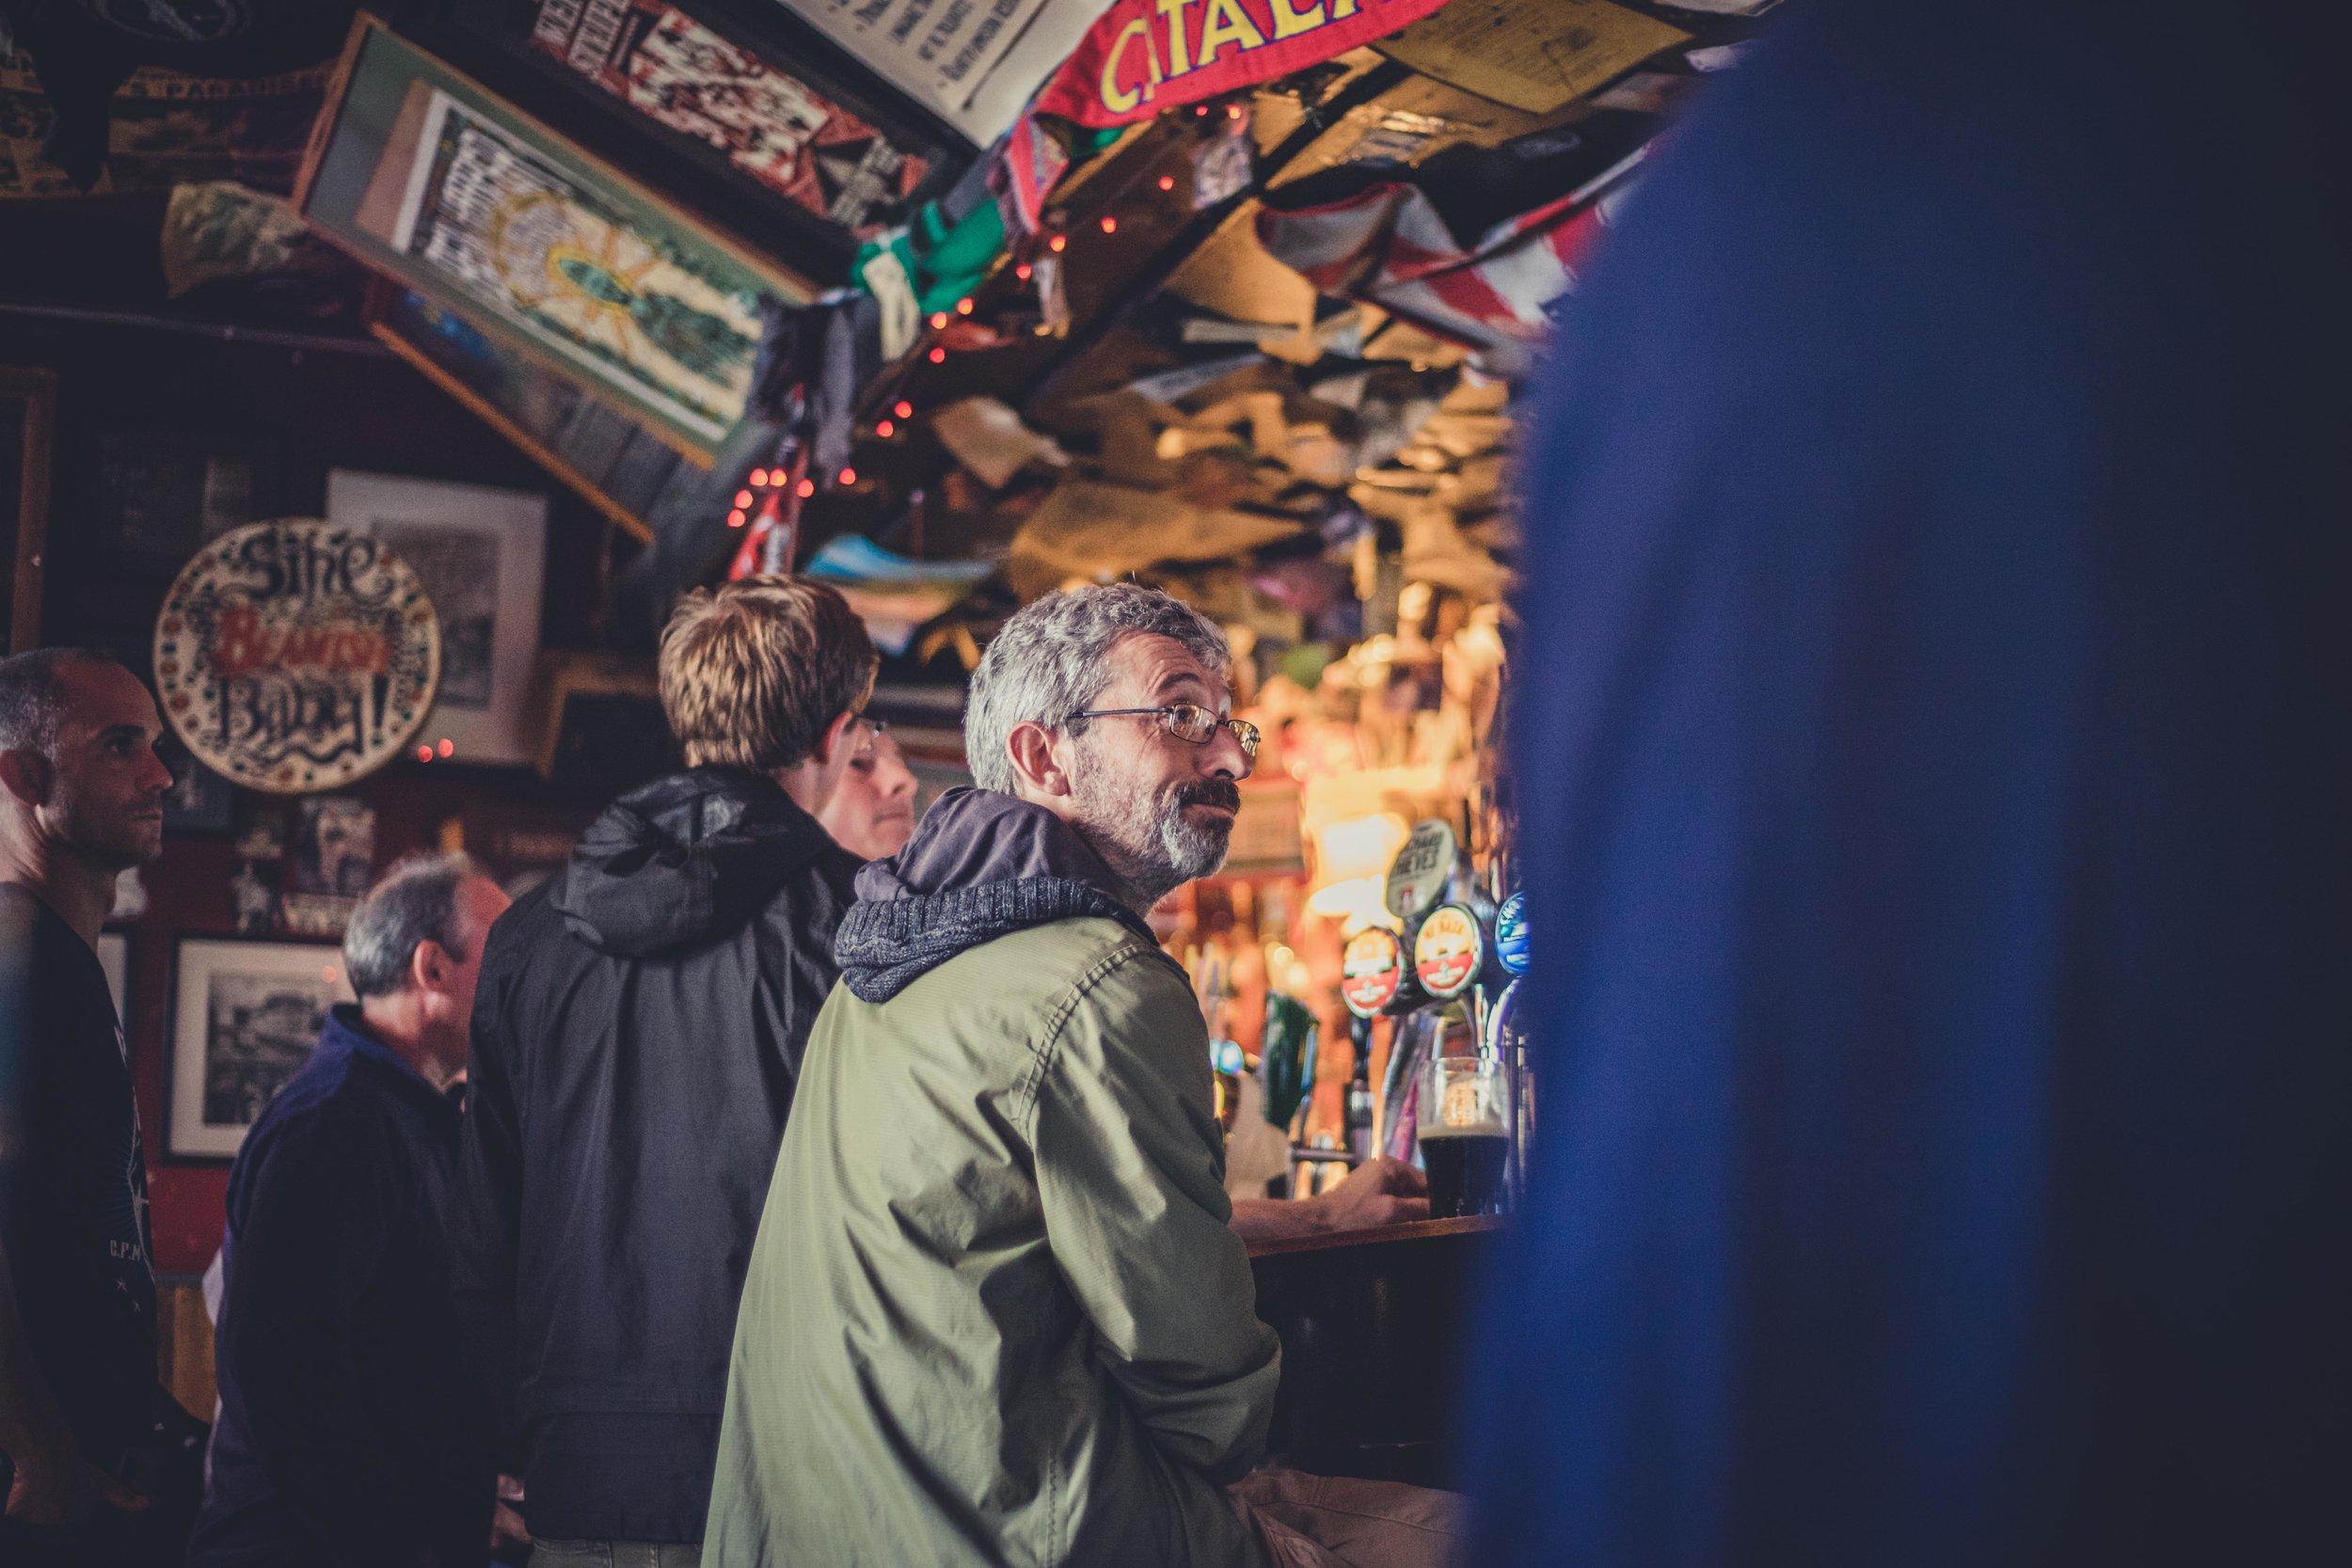 county cork. cork. ireland. irish. history. city. house sitting. old. travel. travel photography. travel photographer. lough hyne. hiking. outdoor. adventure. in the pub.jpg